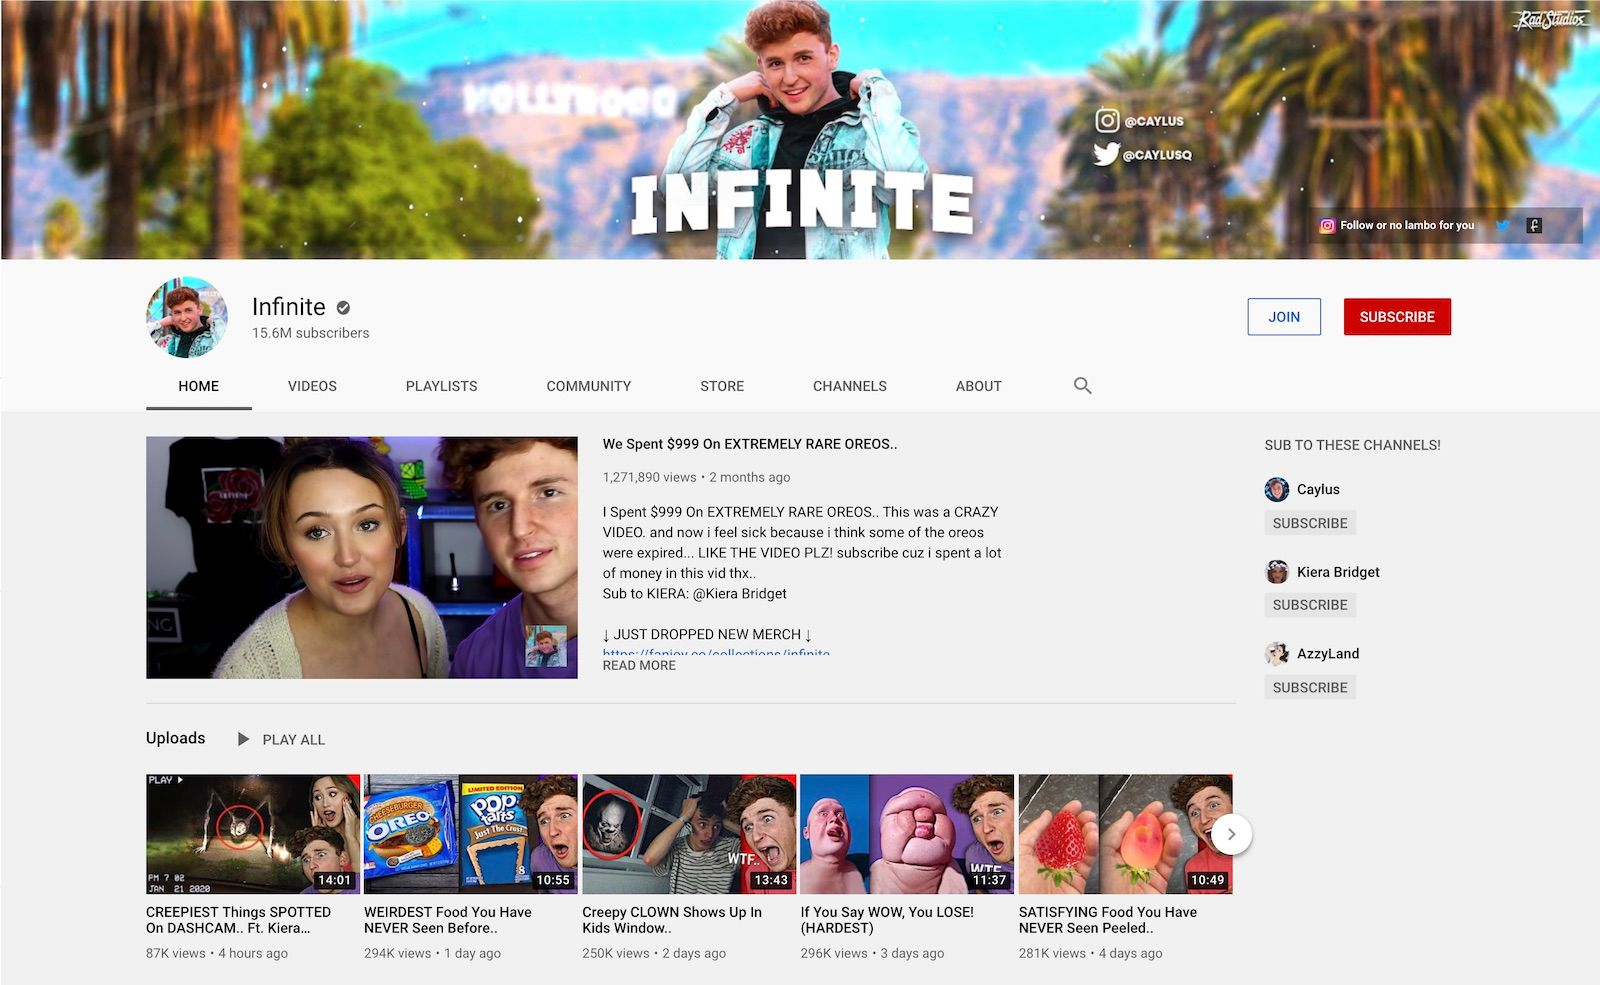 Infinite YouTube